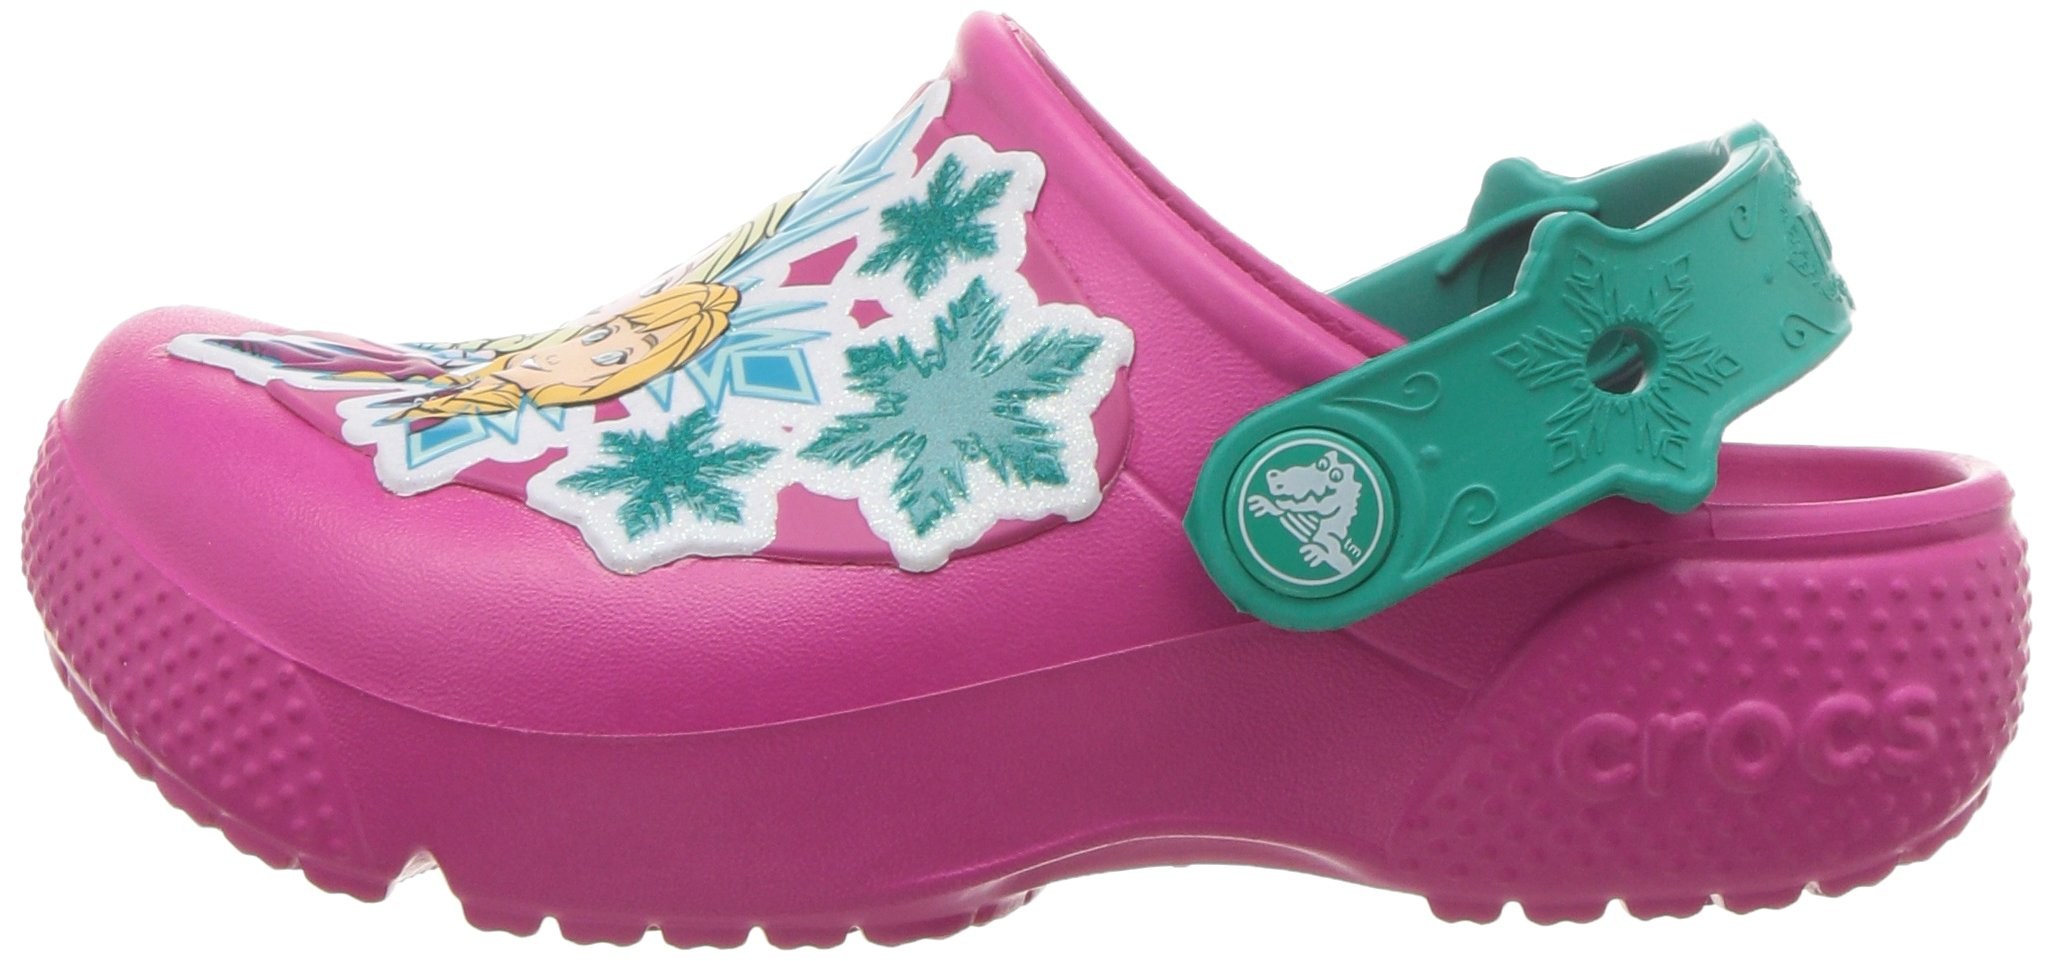 Crocs Girls' Fun Lab Frozen Clog K, Candy Pink, 10 M US Little Kid by Crocs (Image #5)